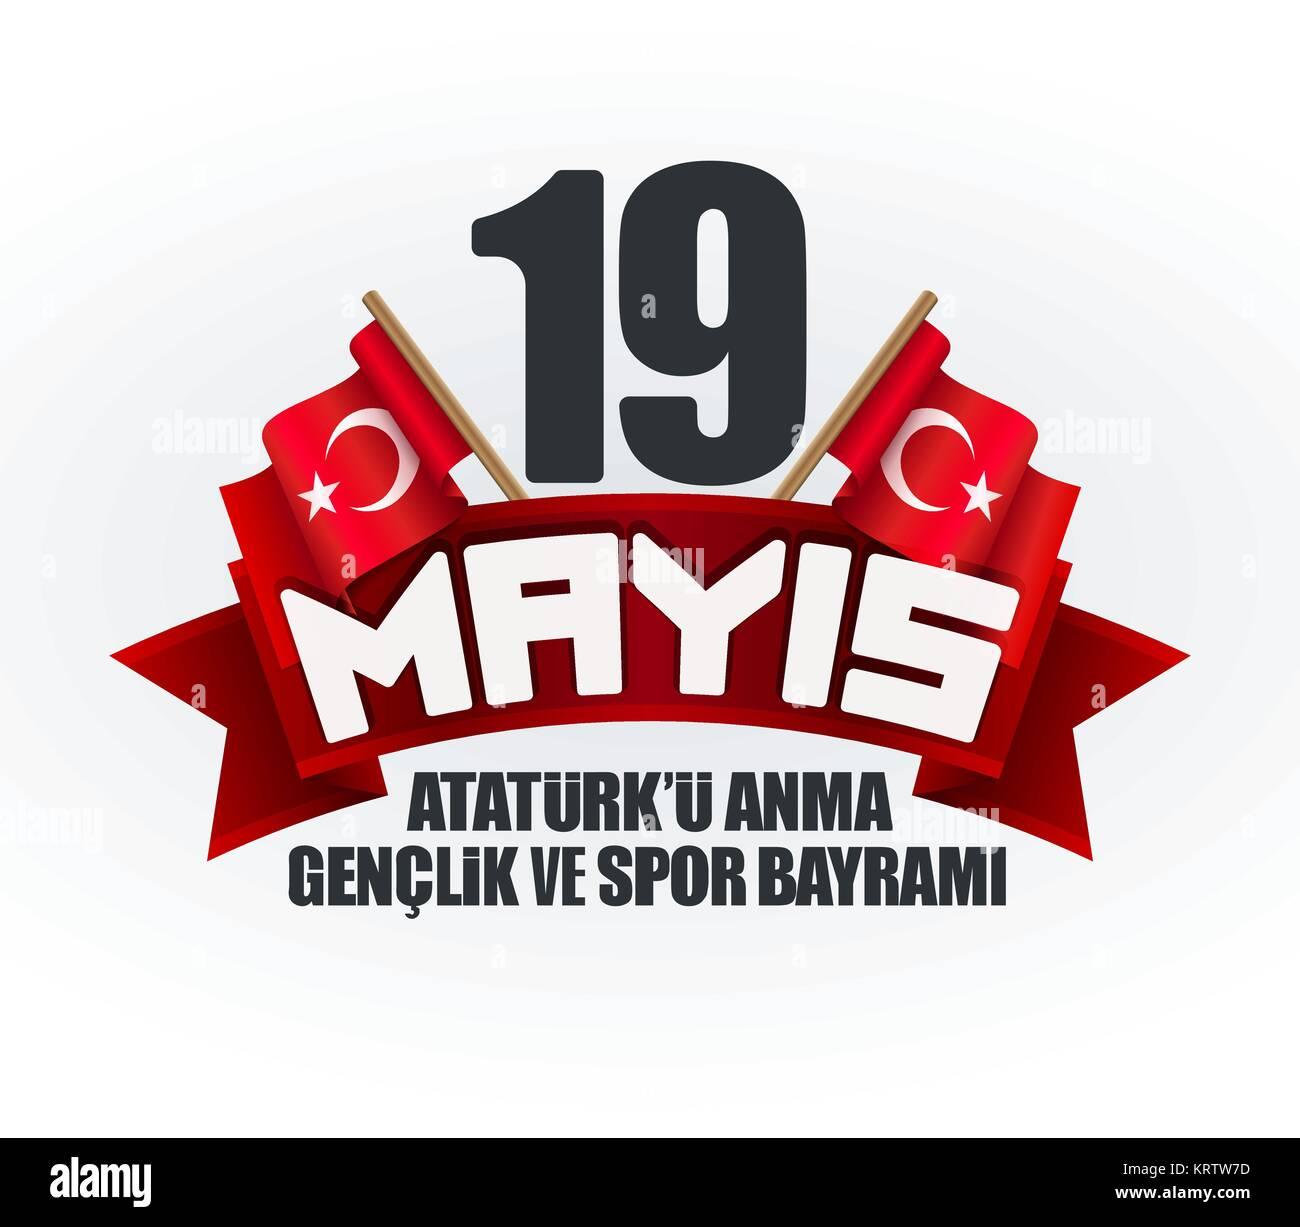 19 Mayis Ataturk'u Anma Genclik Ve Spor Bayrami Tebrik